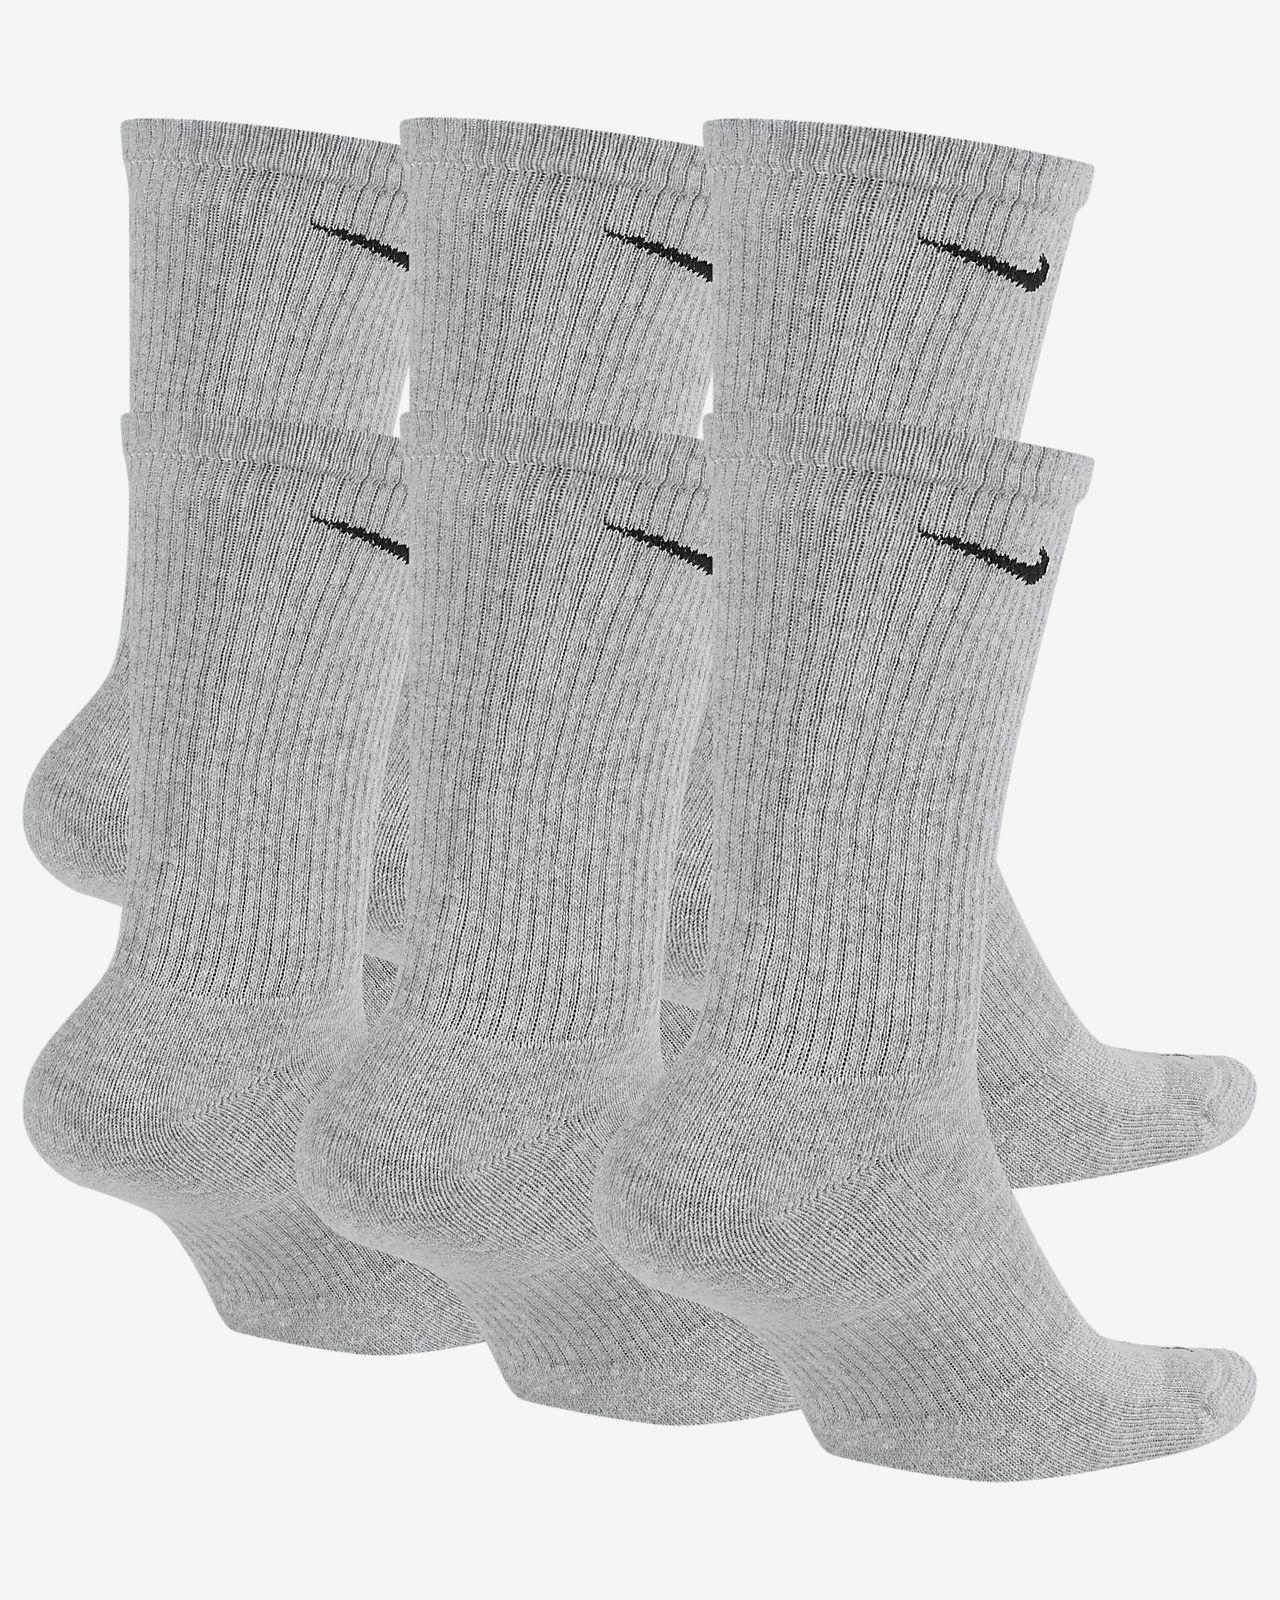 e5b7651768 Nike Everyday Plus Cushion Crew Training Socks (6 Pair). Nike.com